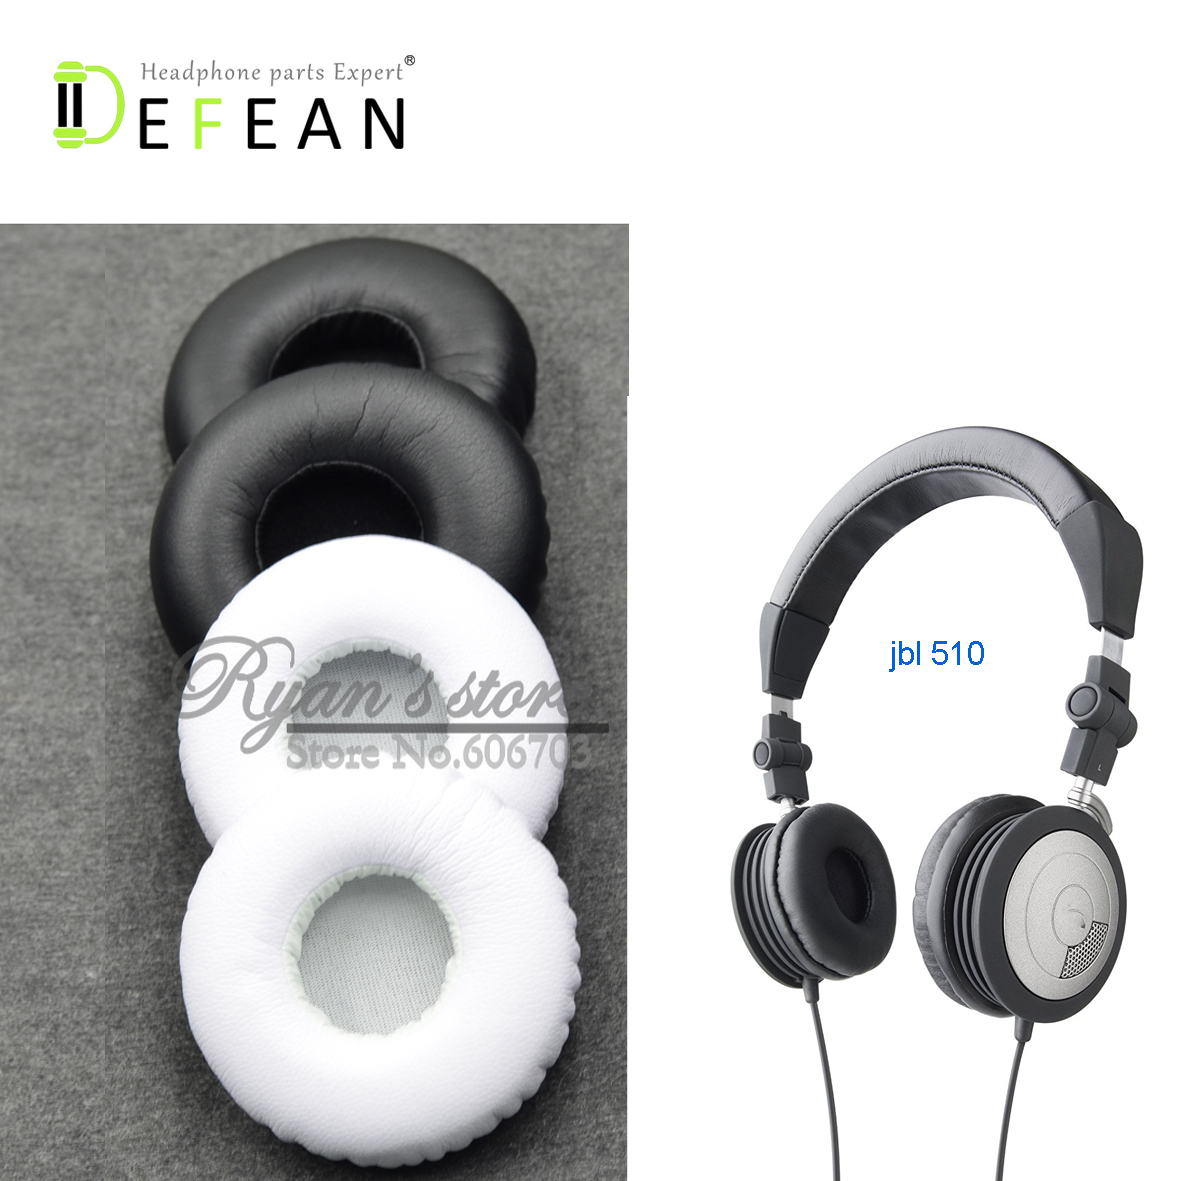 Defean Headphone Parts Hot Sale 52mm Black White Upgrade Cushion Ear Pads For Jbl Referance 410 510 Headphones Bluetooth Earphones Headphones Aliexpress